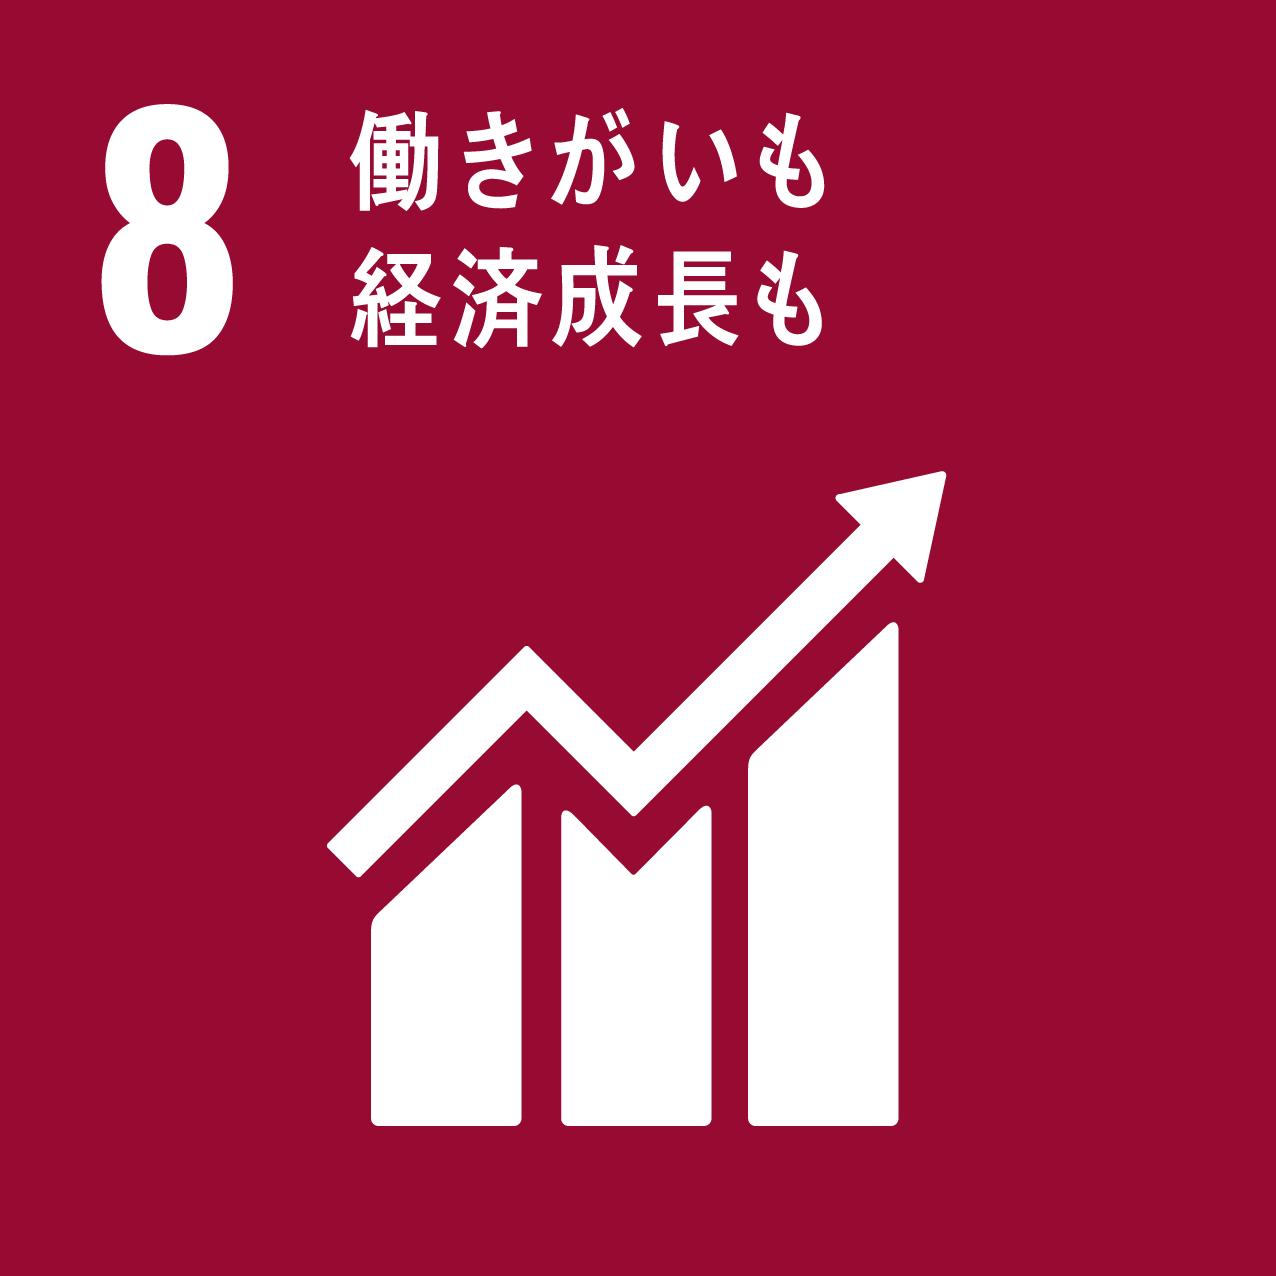 SDGs ゴール8「働きがいも経済成長も」